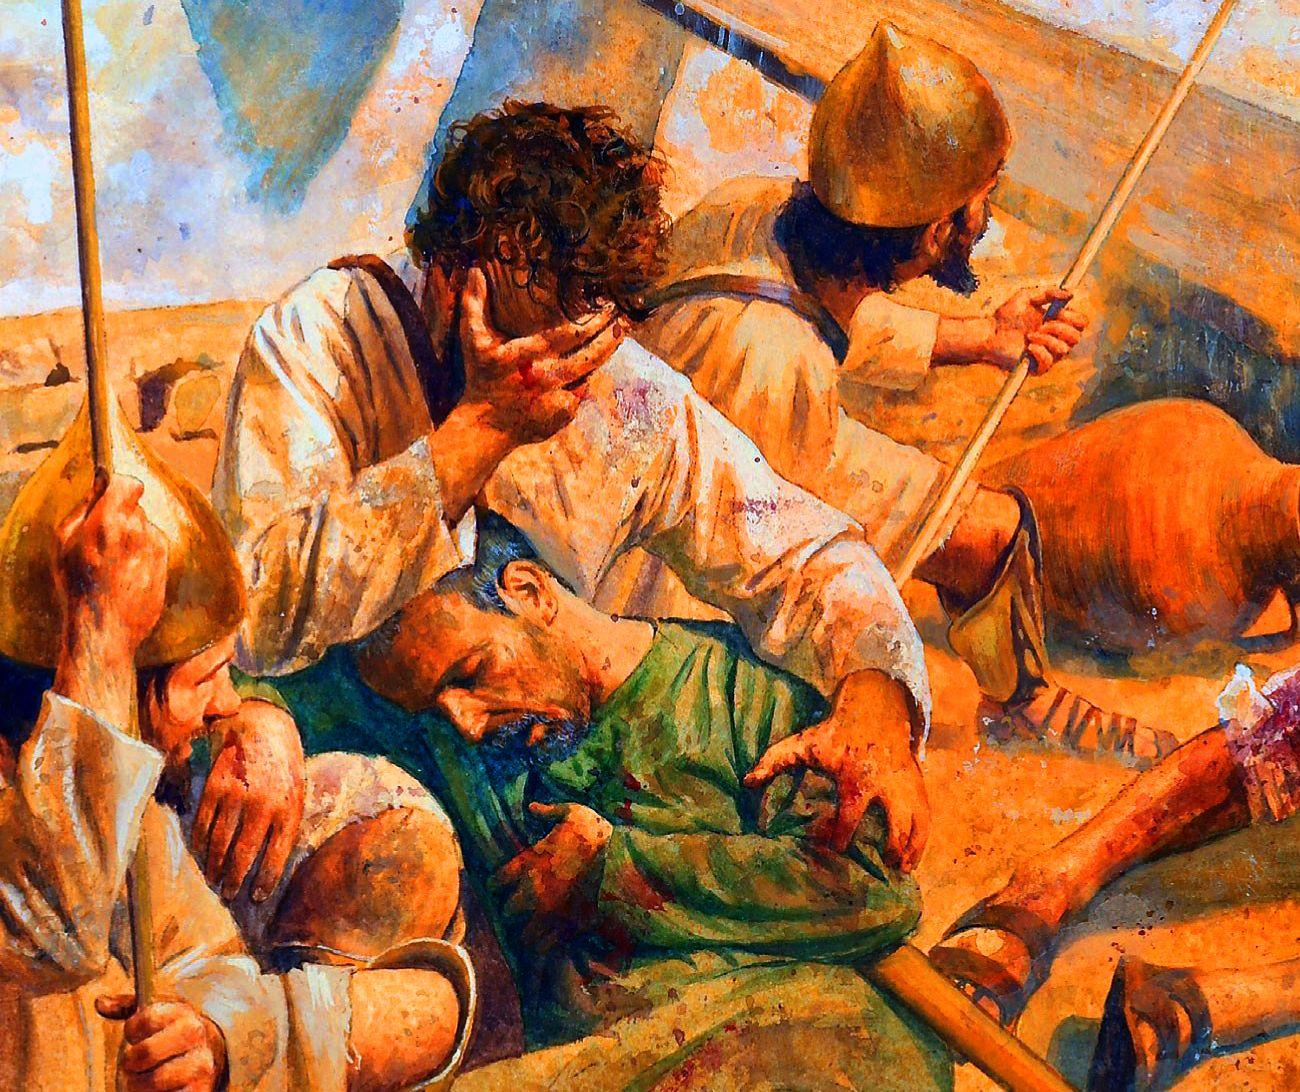 Carthaginian militias defending Carthage during the Punic War